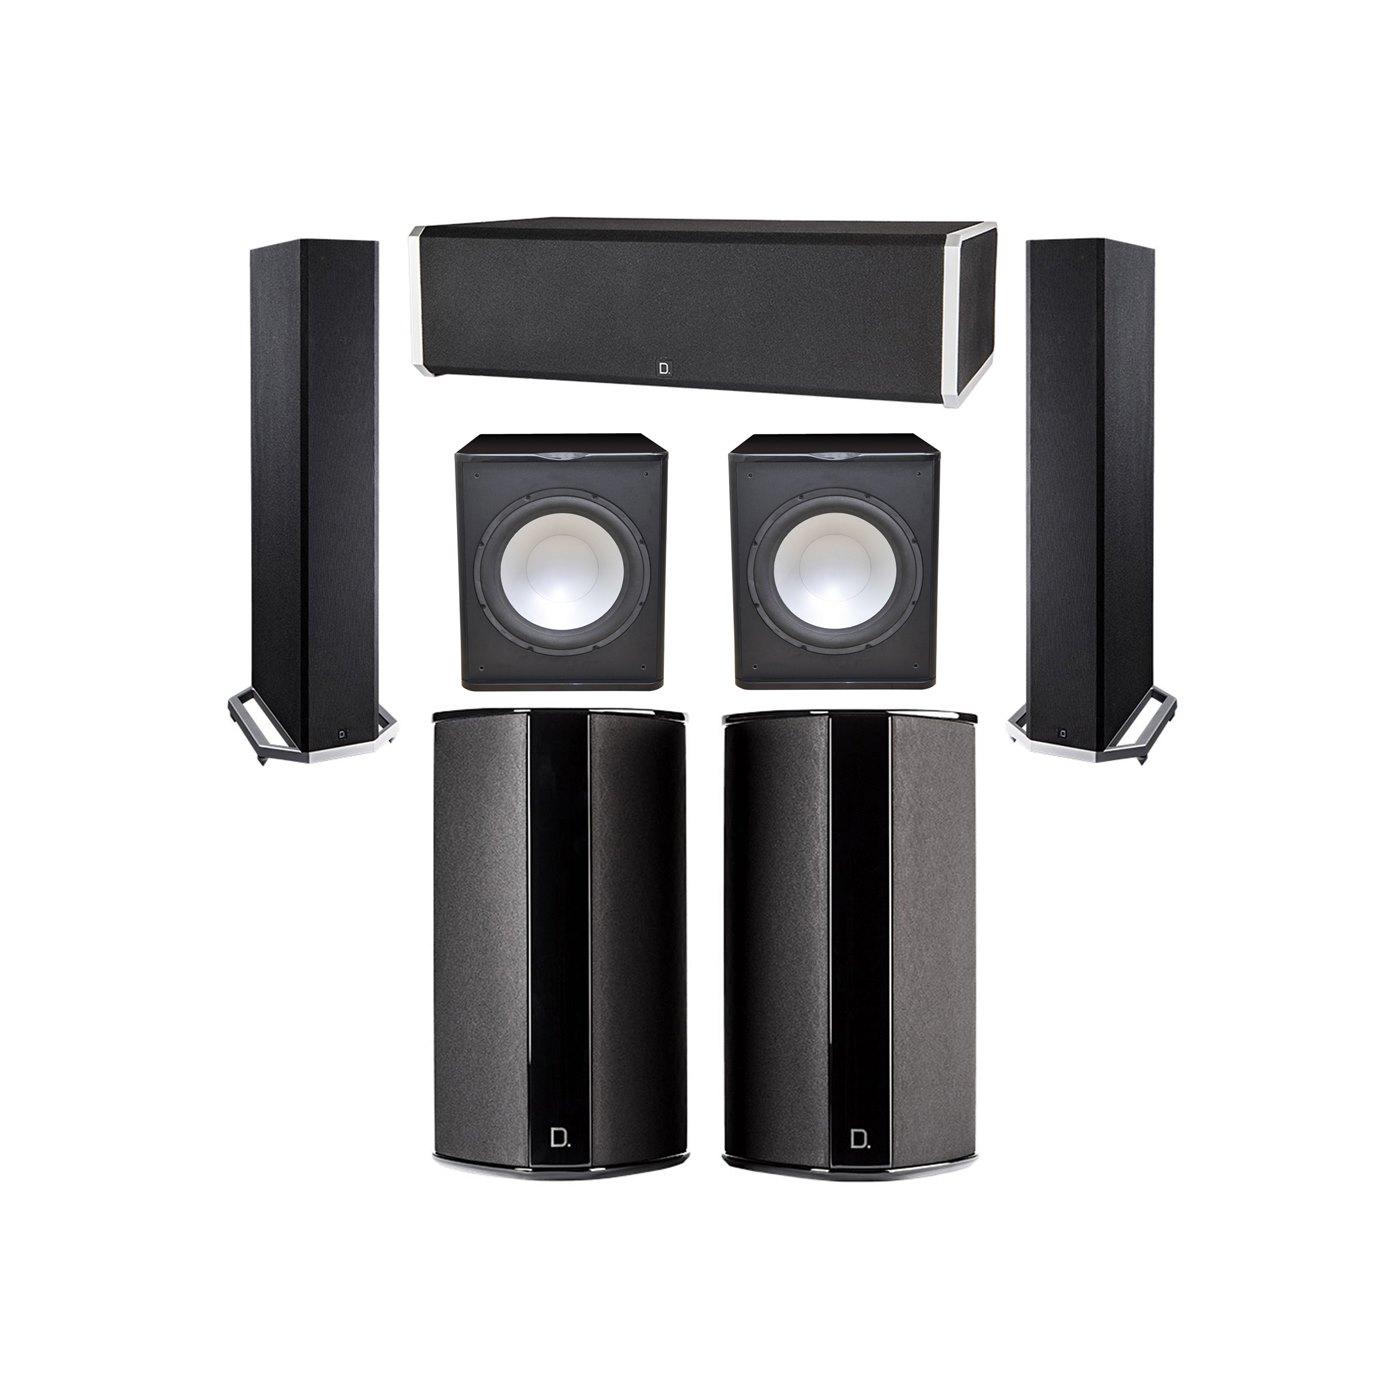 Definitive Technology 5.2 System with 2 BP9020 Tower Speakers, 1 CS9060 Center Channel Speaker, 2 SR9080 Surround Speaker, 2 Premier Acoustic PA-150 Subwoofer